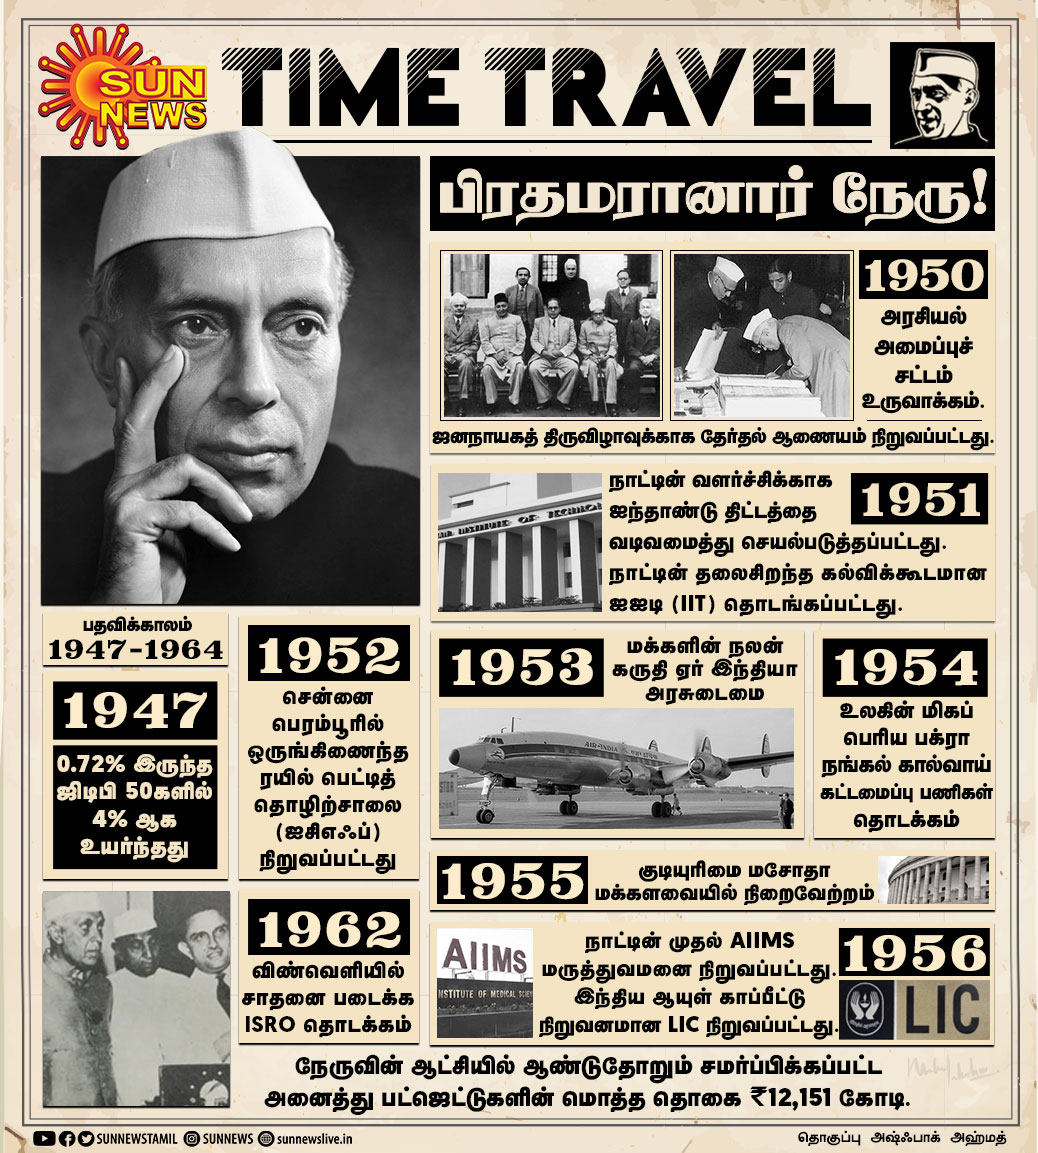 #TIMETRAVEL   பிரதமரானார் நேரு!  #SunNewsTimeTravel   #PM   #Nehru   #INDIA   #AirIndia   #LIC   #AIIMS   #IIT   #ElectionCommission   #ICF